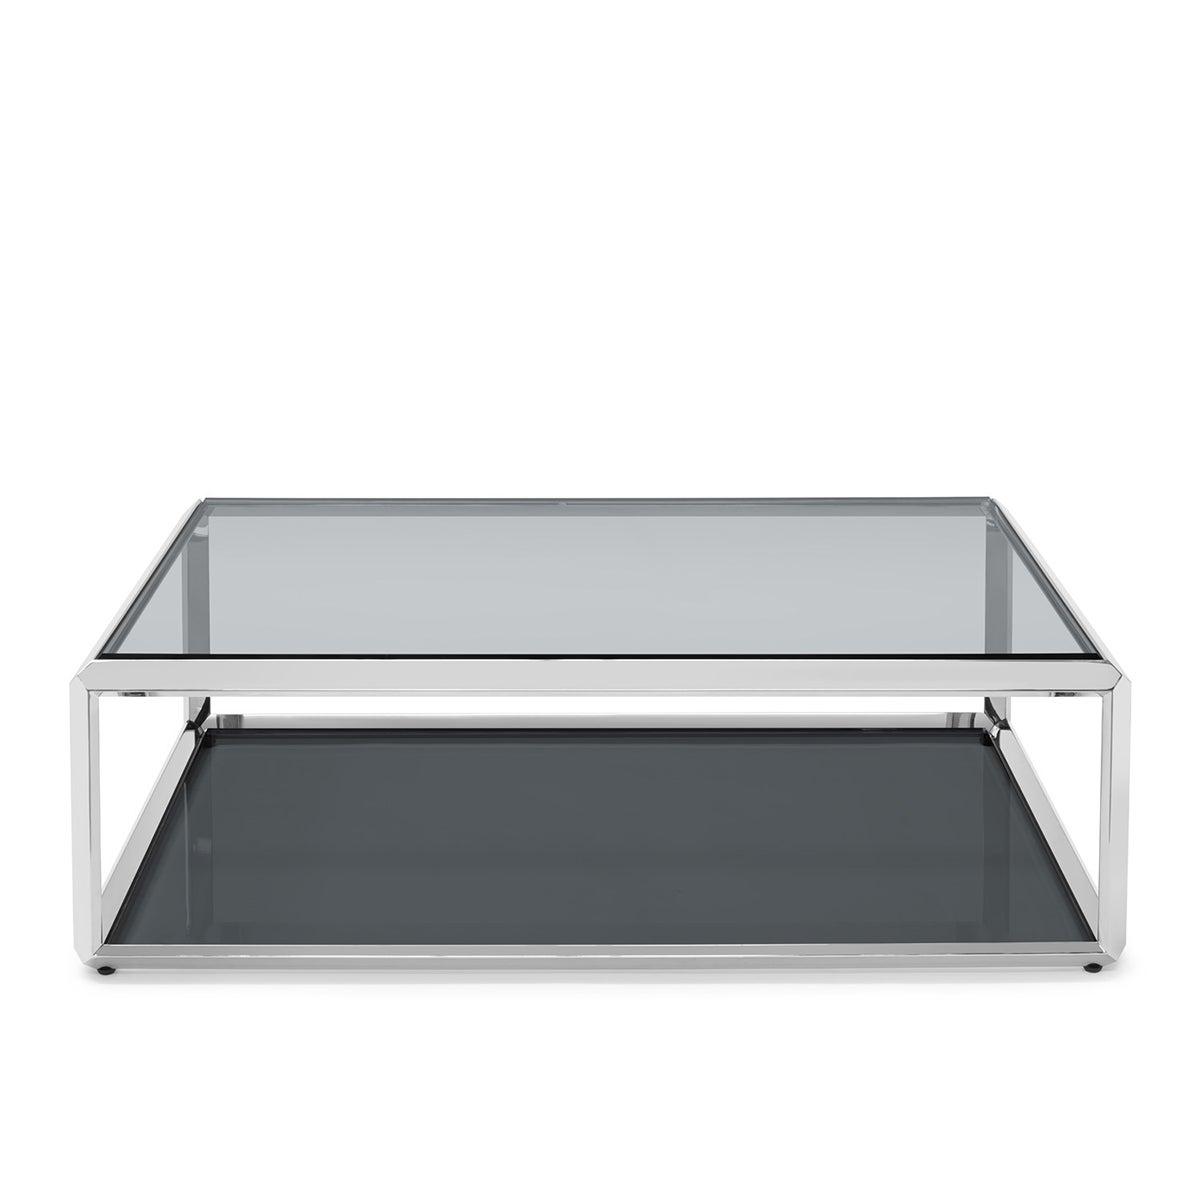 Casiopee Chrome Coffee Table